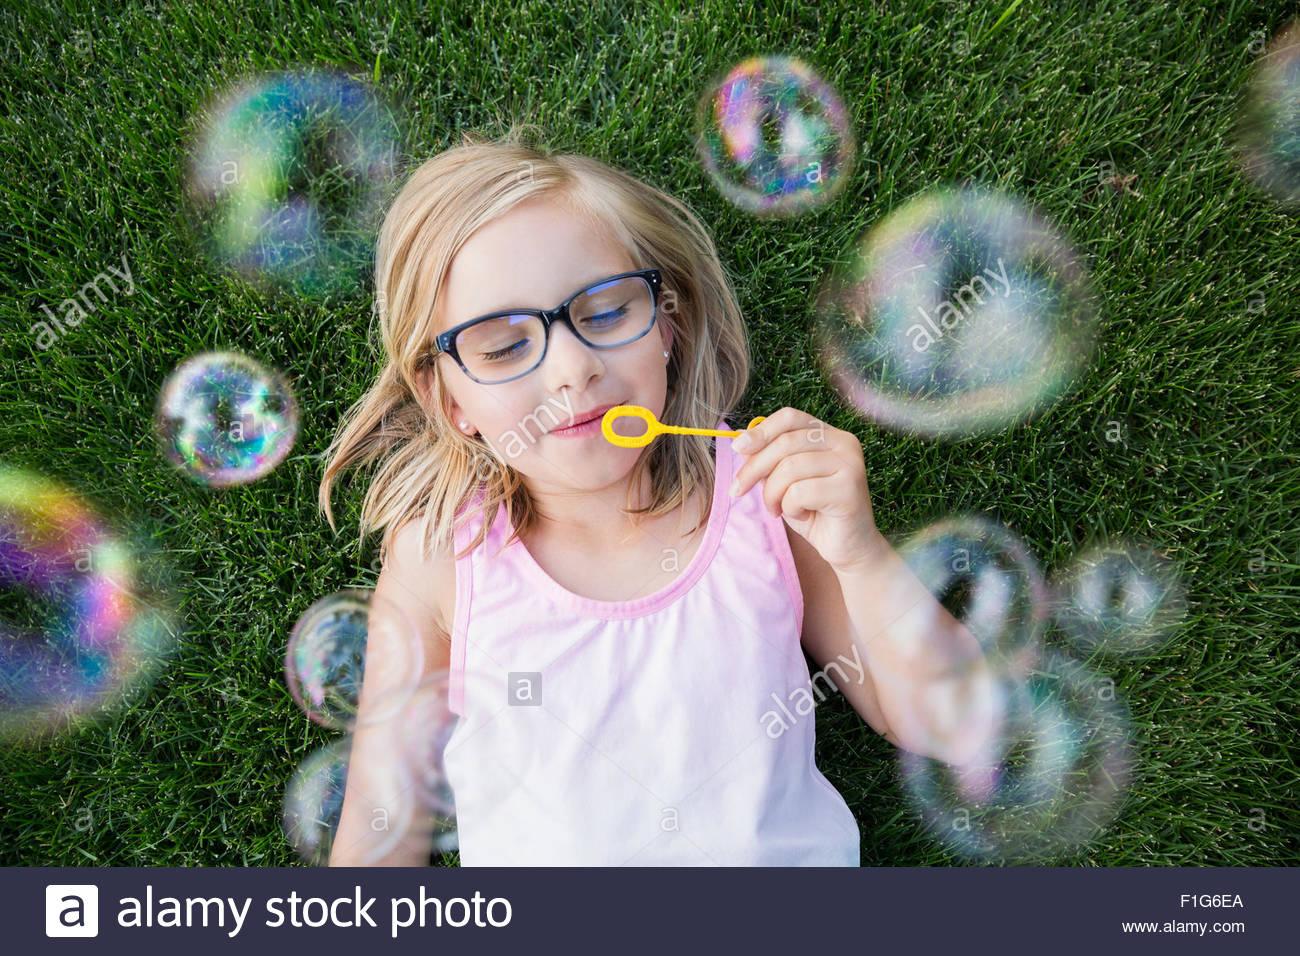 Vista aérea chica rubia con anteojos soplando burbujas Imagen De Stock